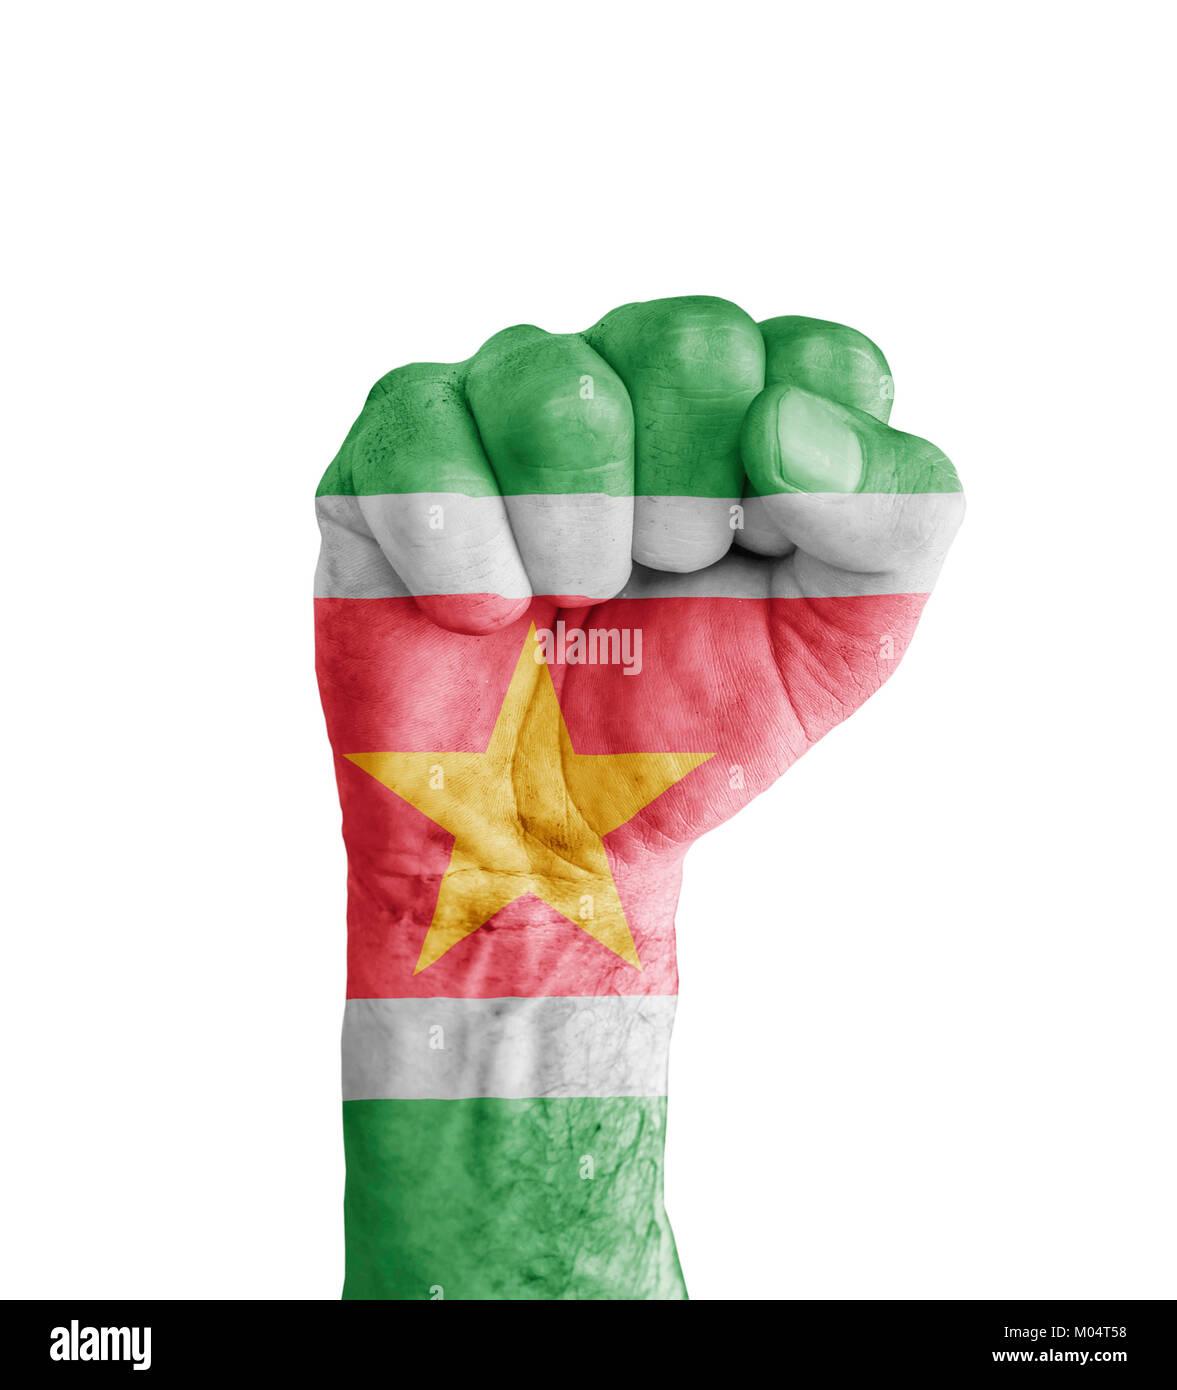 Flag of Suriname painted on human fist like victory symbol - Stock Image